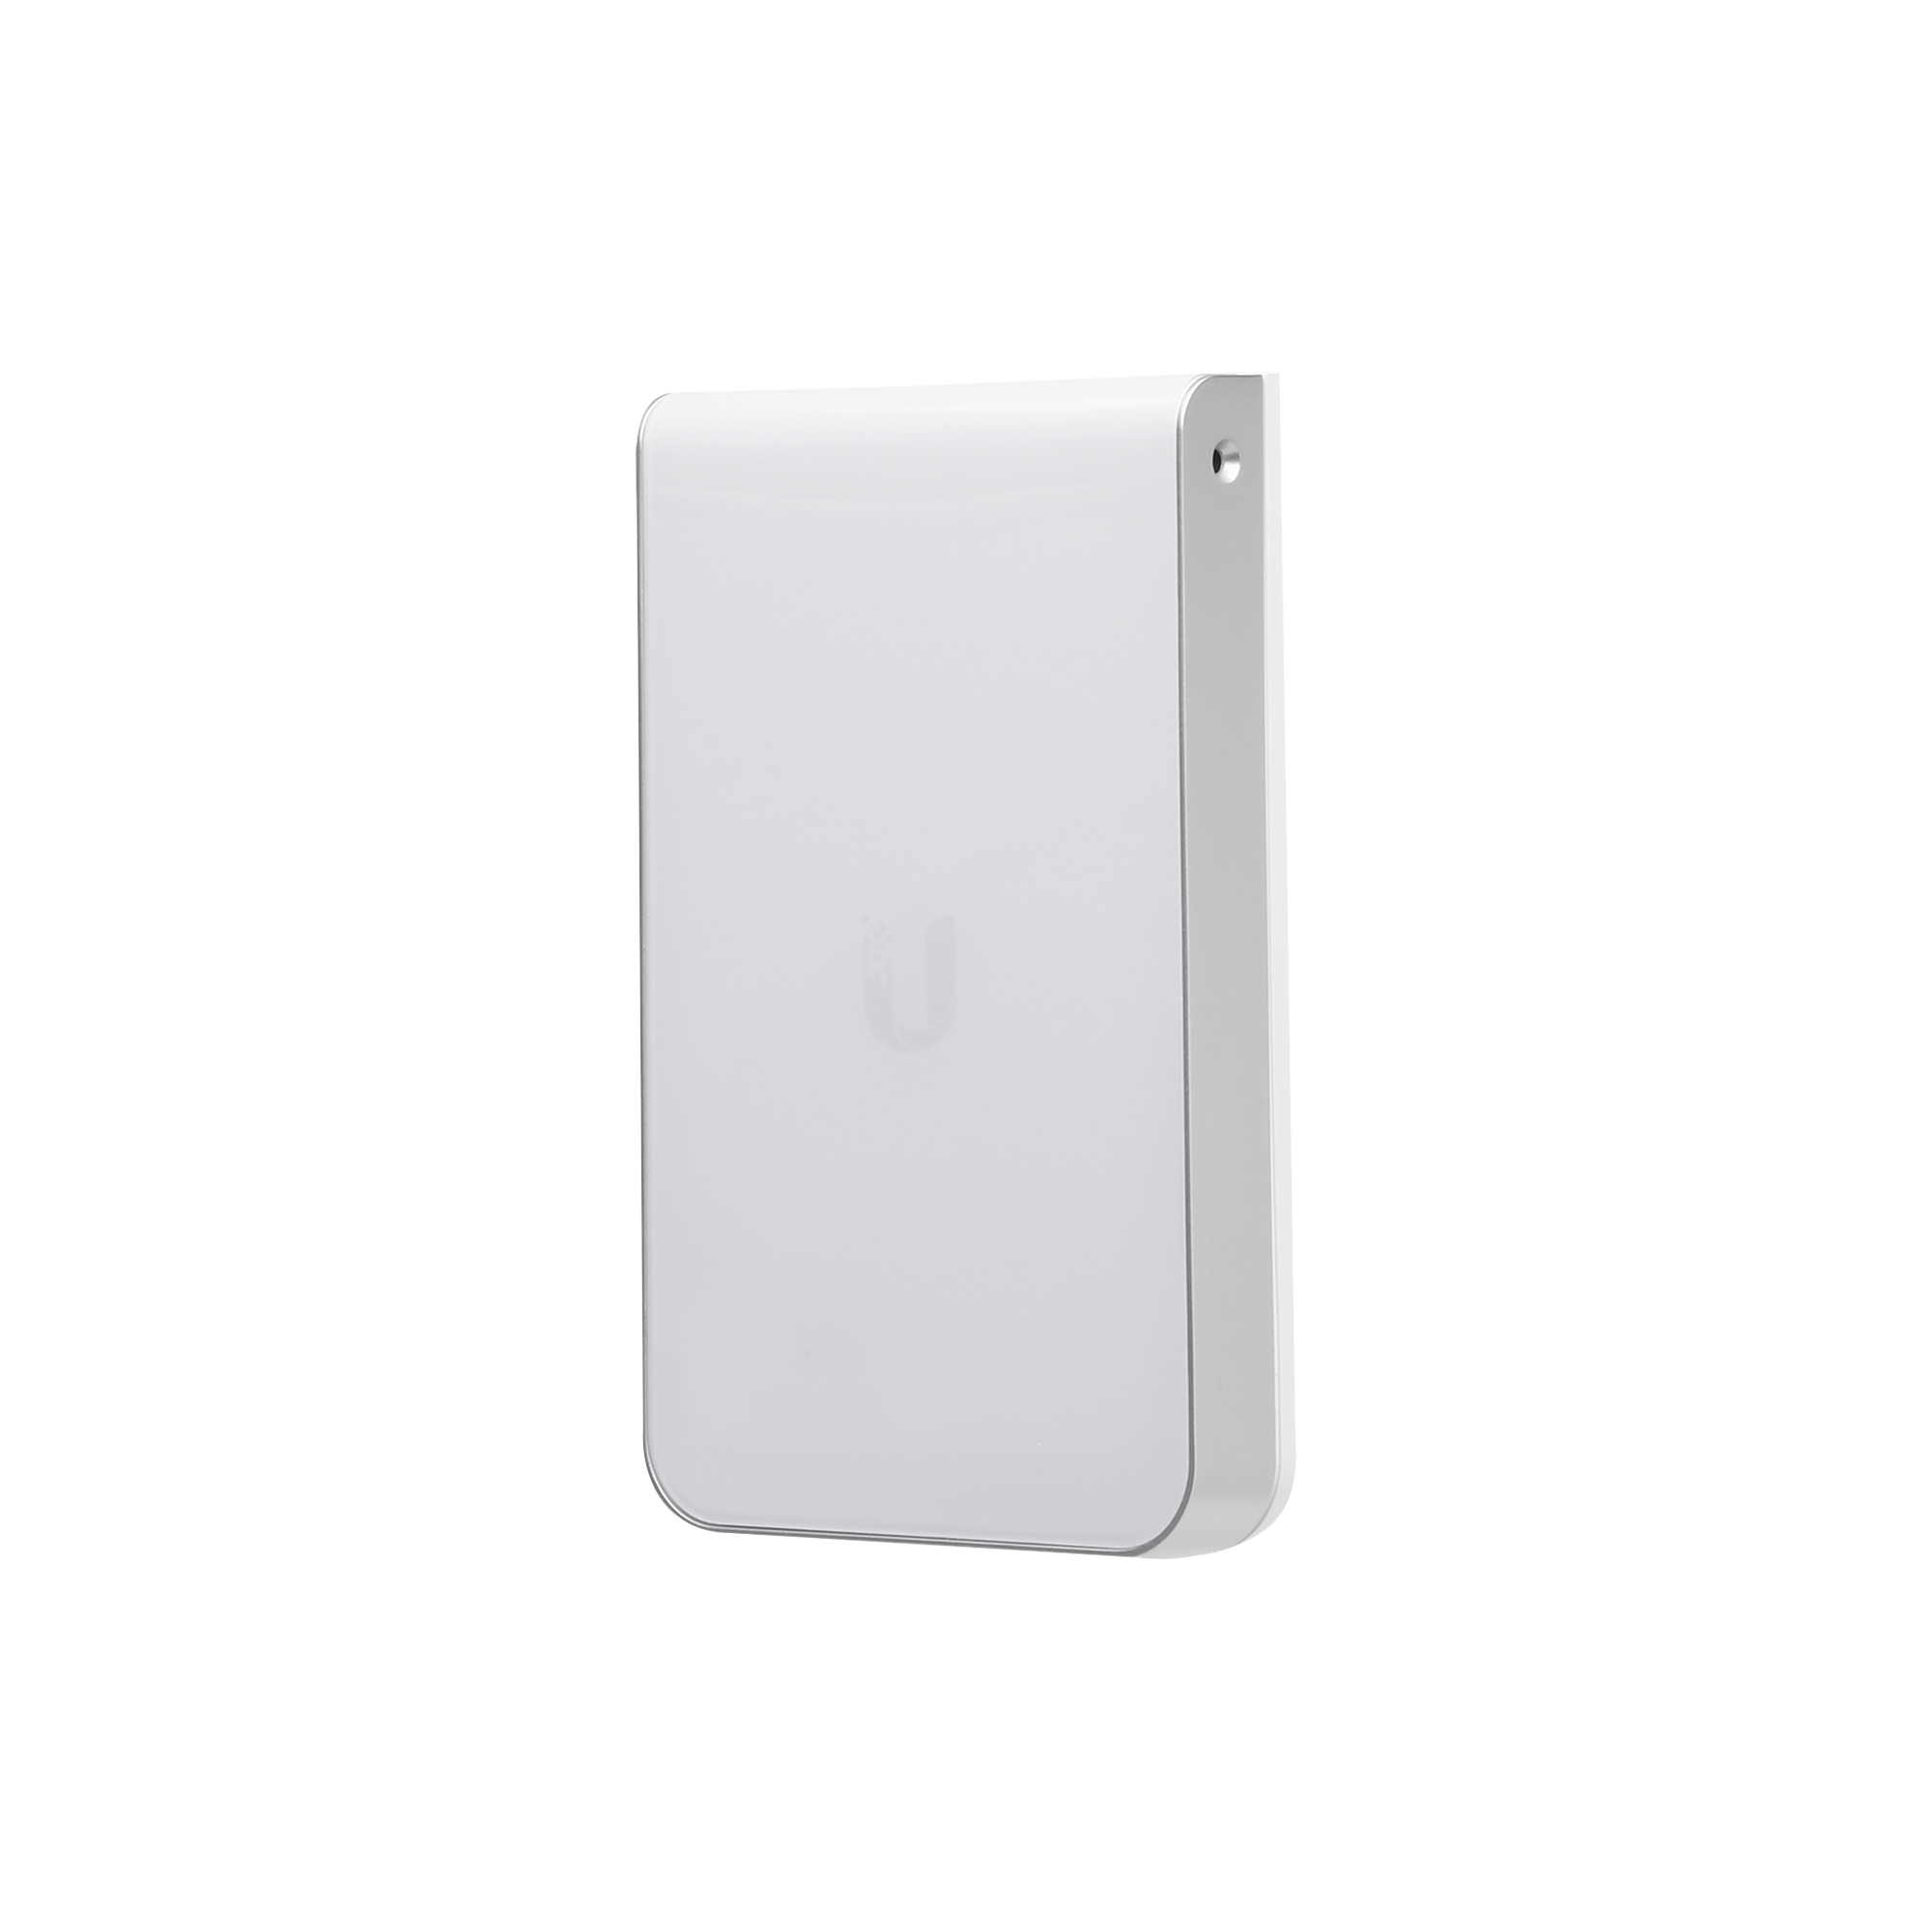 Access Point In Wall HD MU-MIMO 4x4 Wave 2 con 5 puertos (1 PoE entrada 802.3af/at PoE+, 1 PoE salida 48V y 3 Ethernet Passthrough) antena Beamforming, ideal para suites